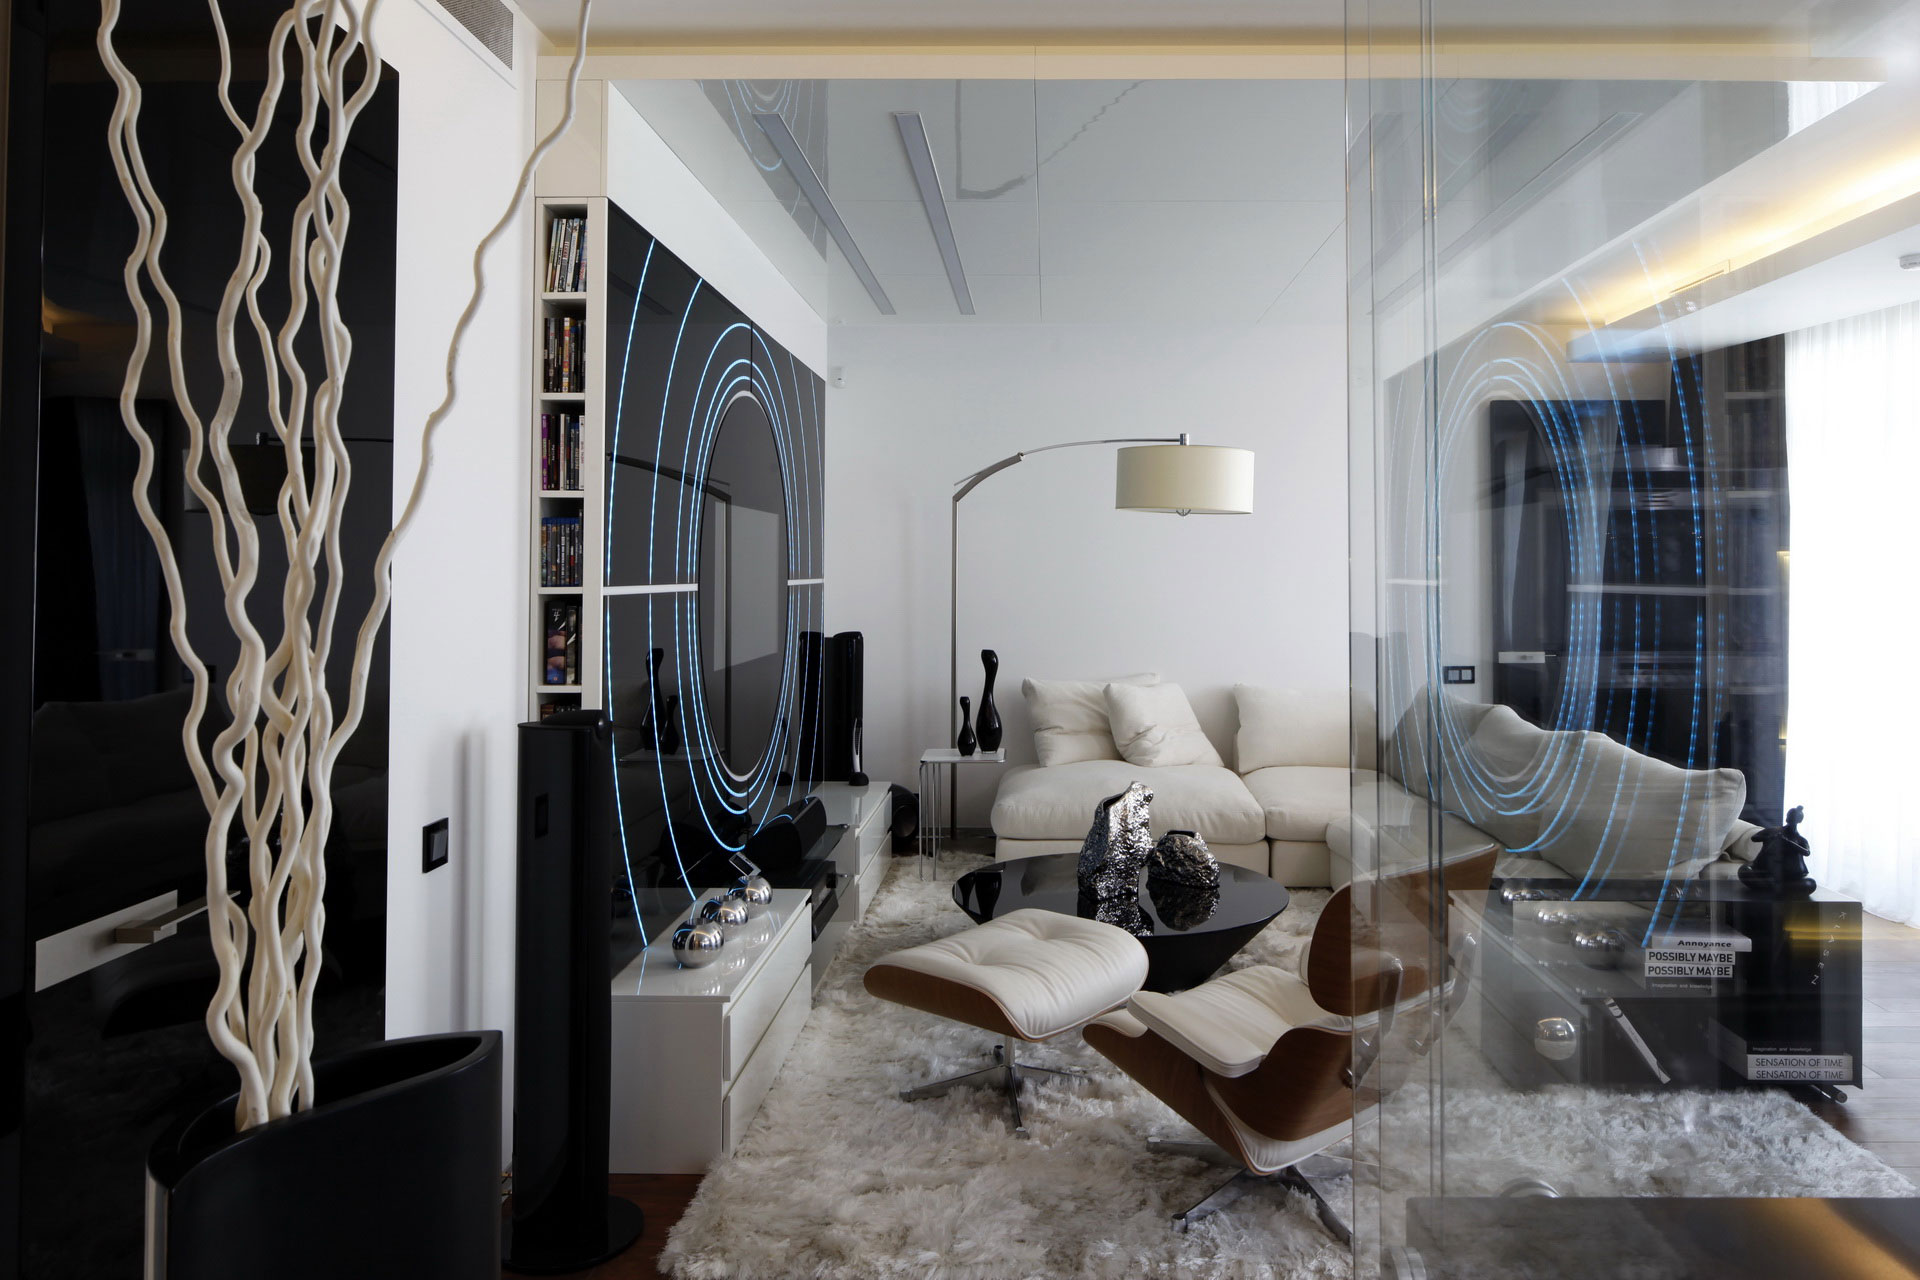 Fantasy island apartment in moscow by gemotrix design